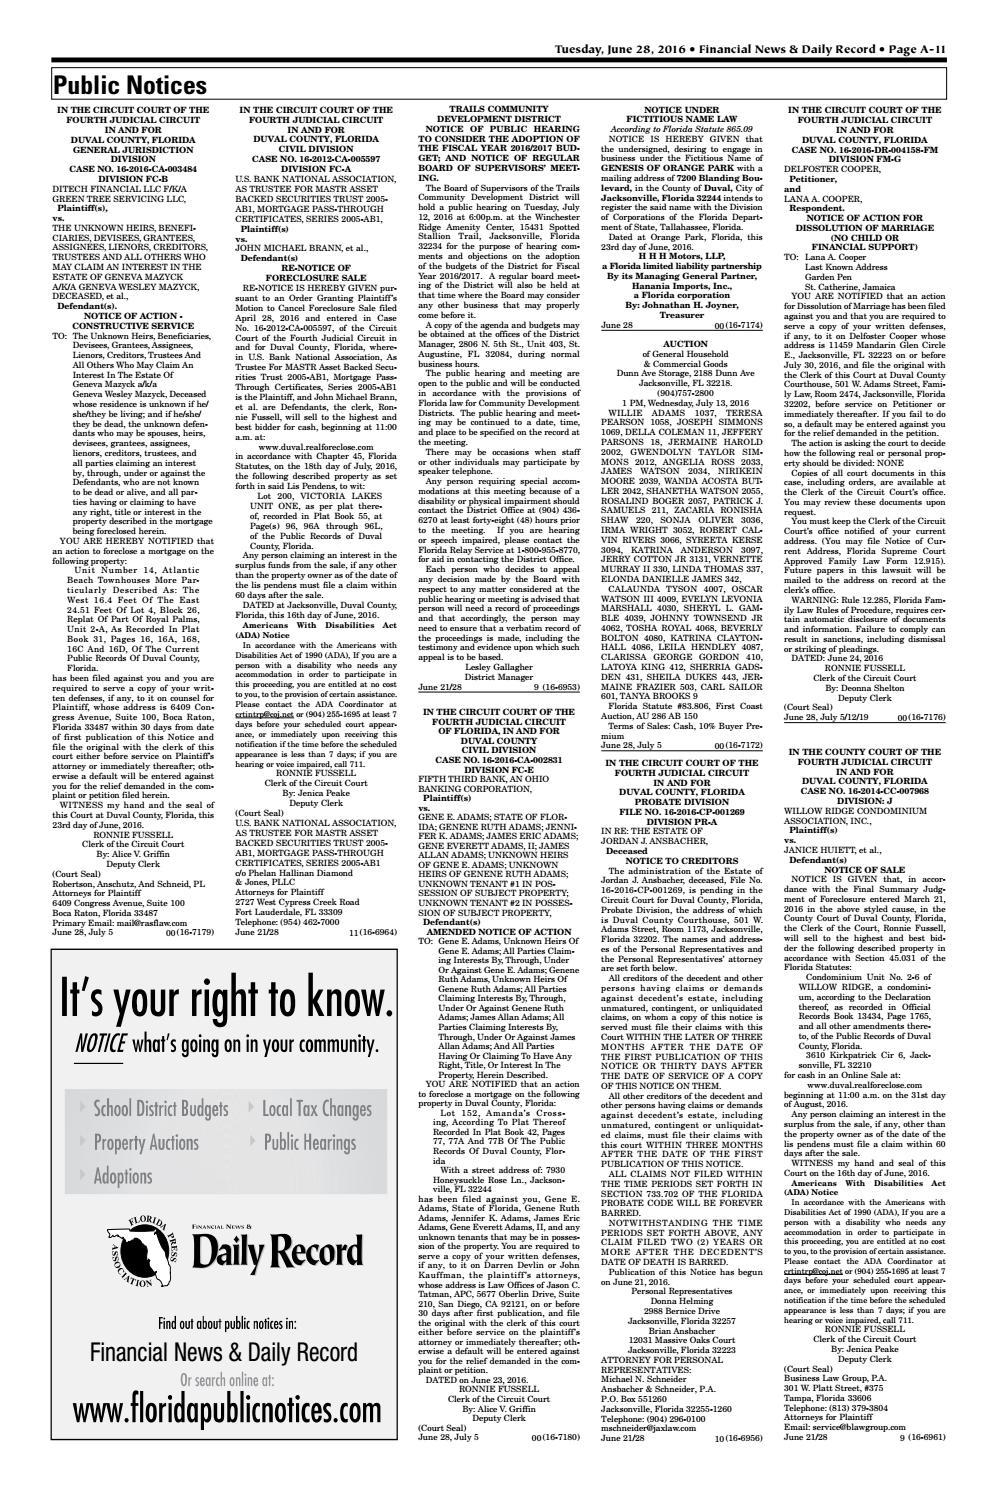 duval cvounty florida official public records search